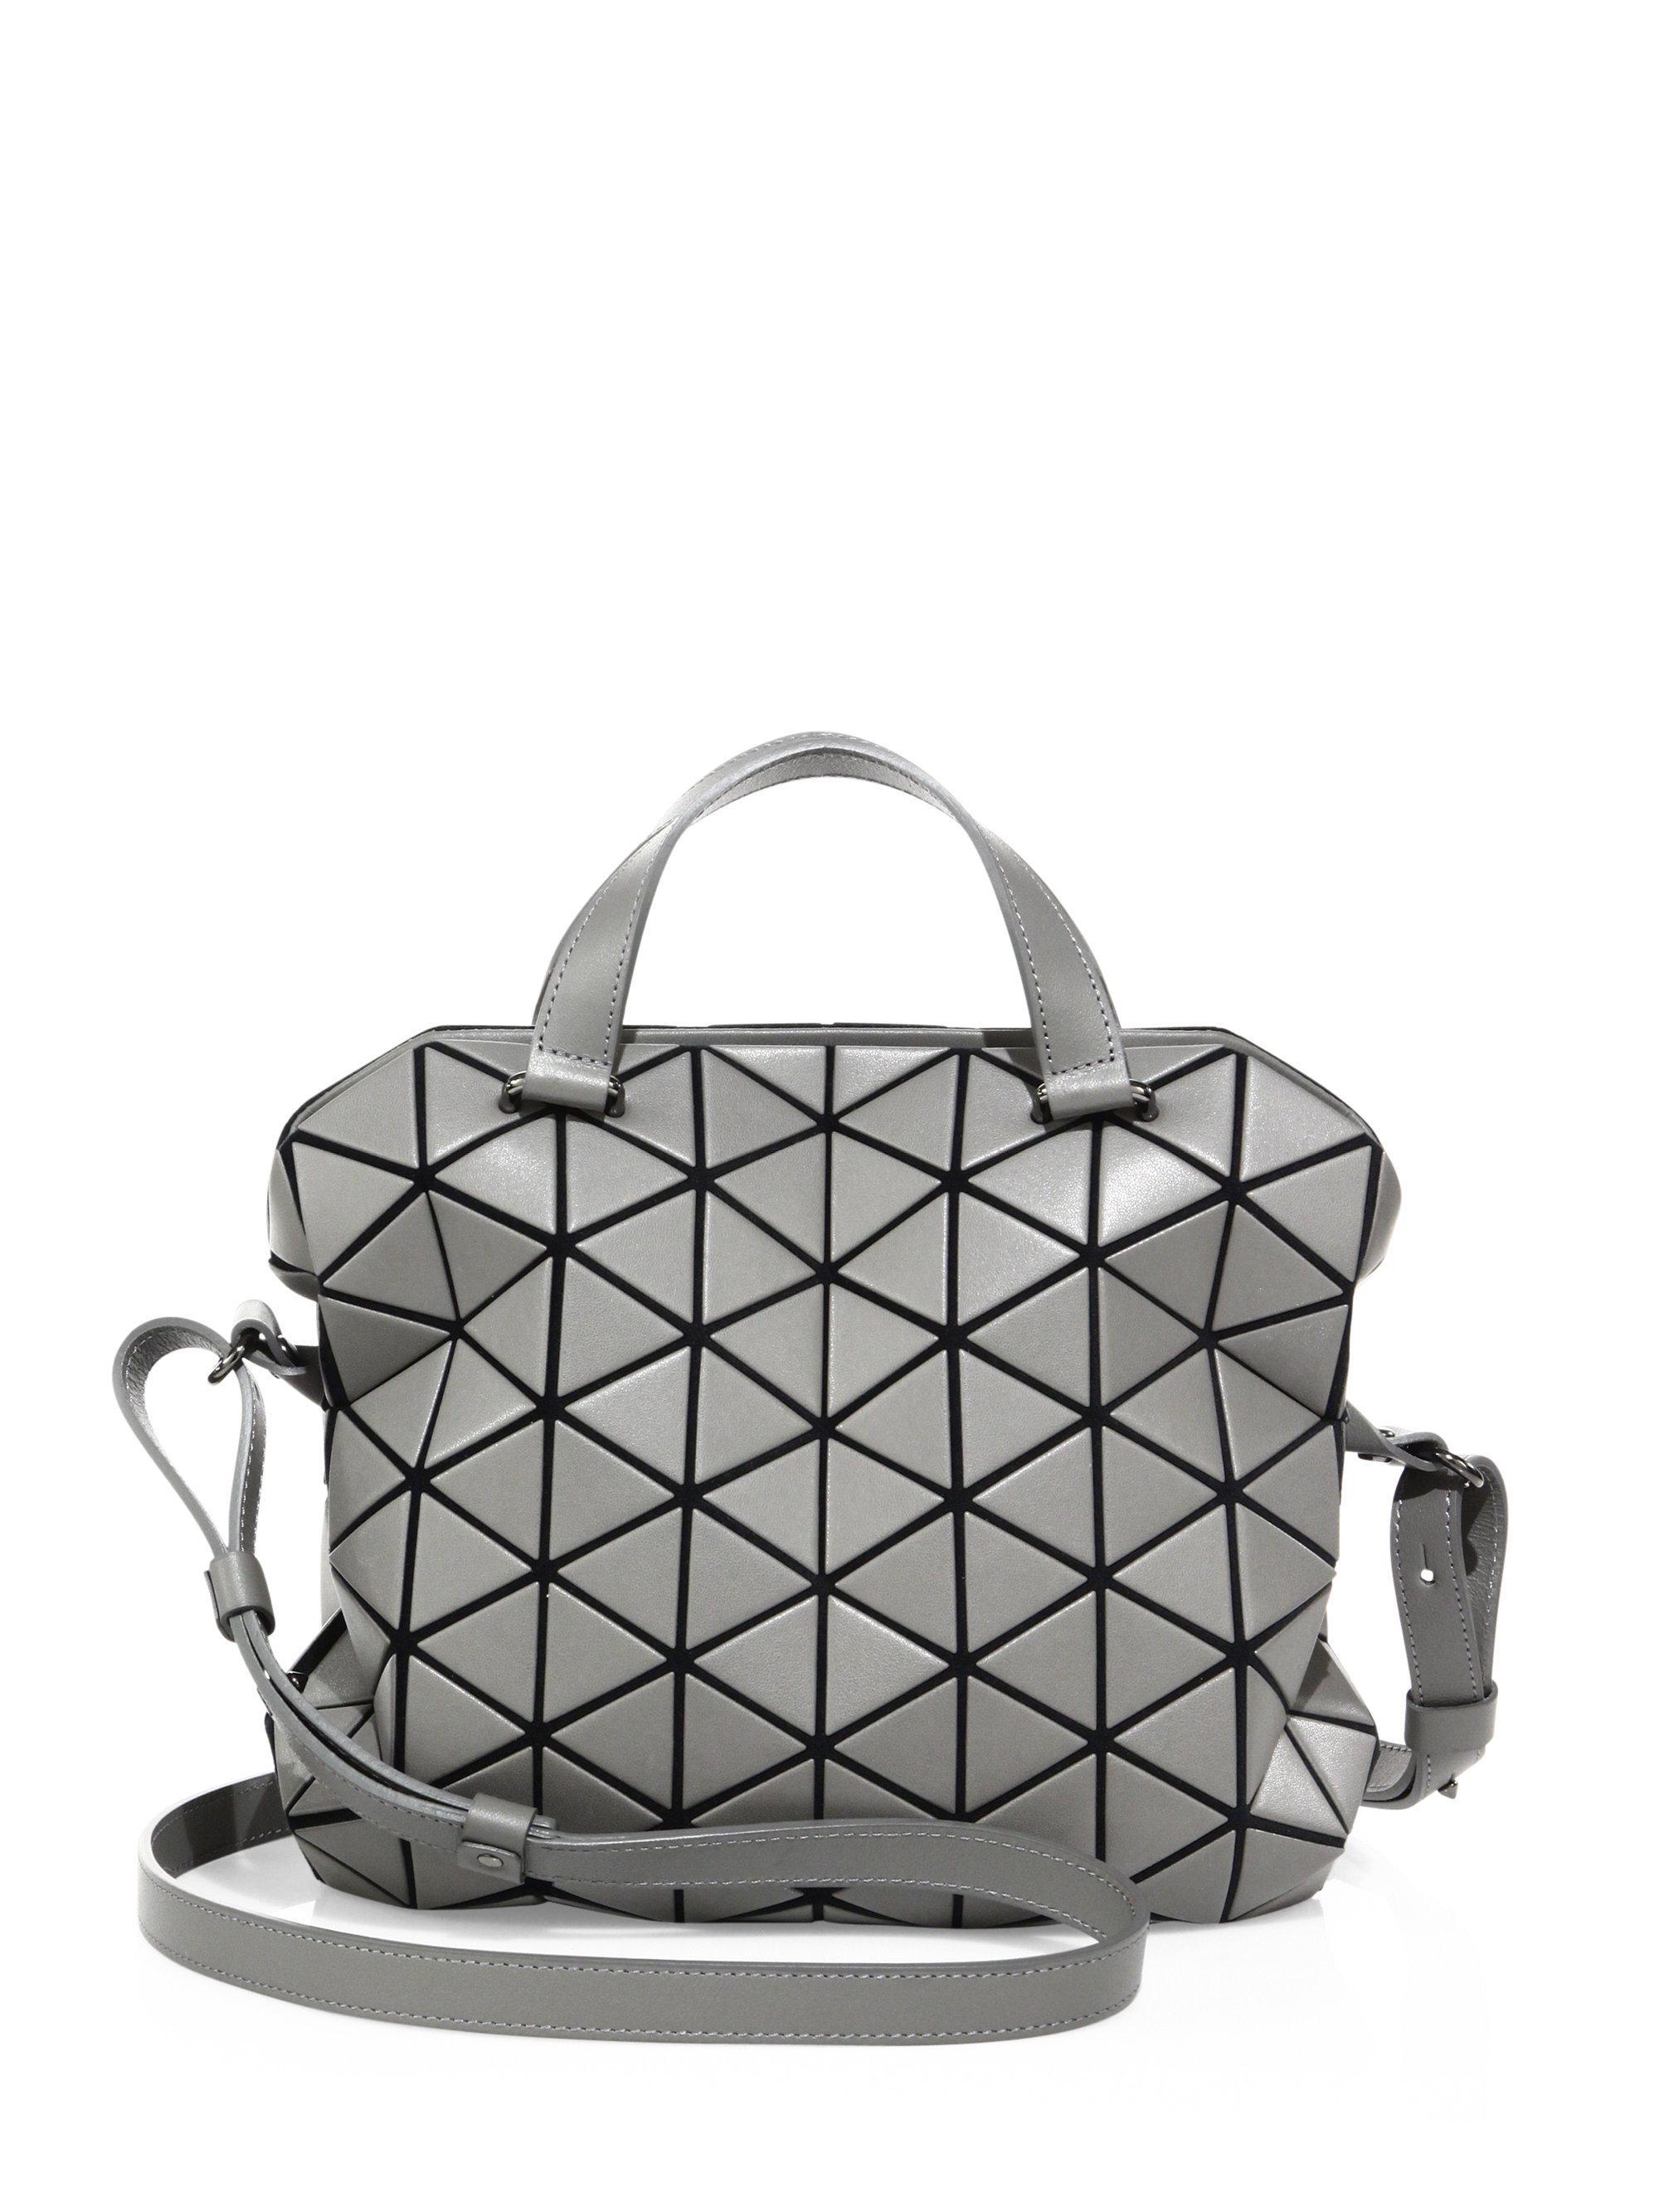 d0ca6480bf Lyst - Bao Bao Issey Miyake Bao Bao Tonneau Boston Bag in Gray